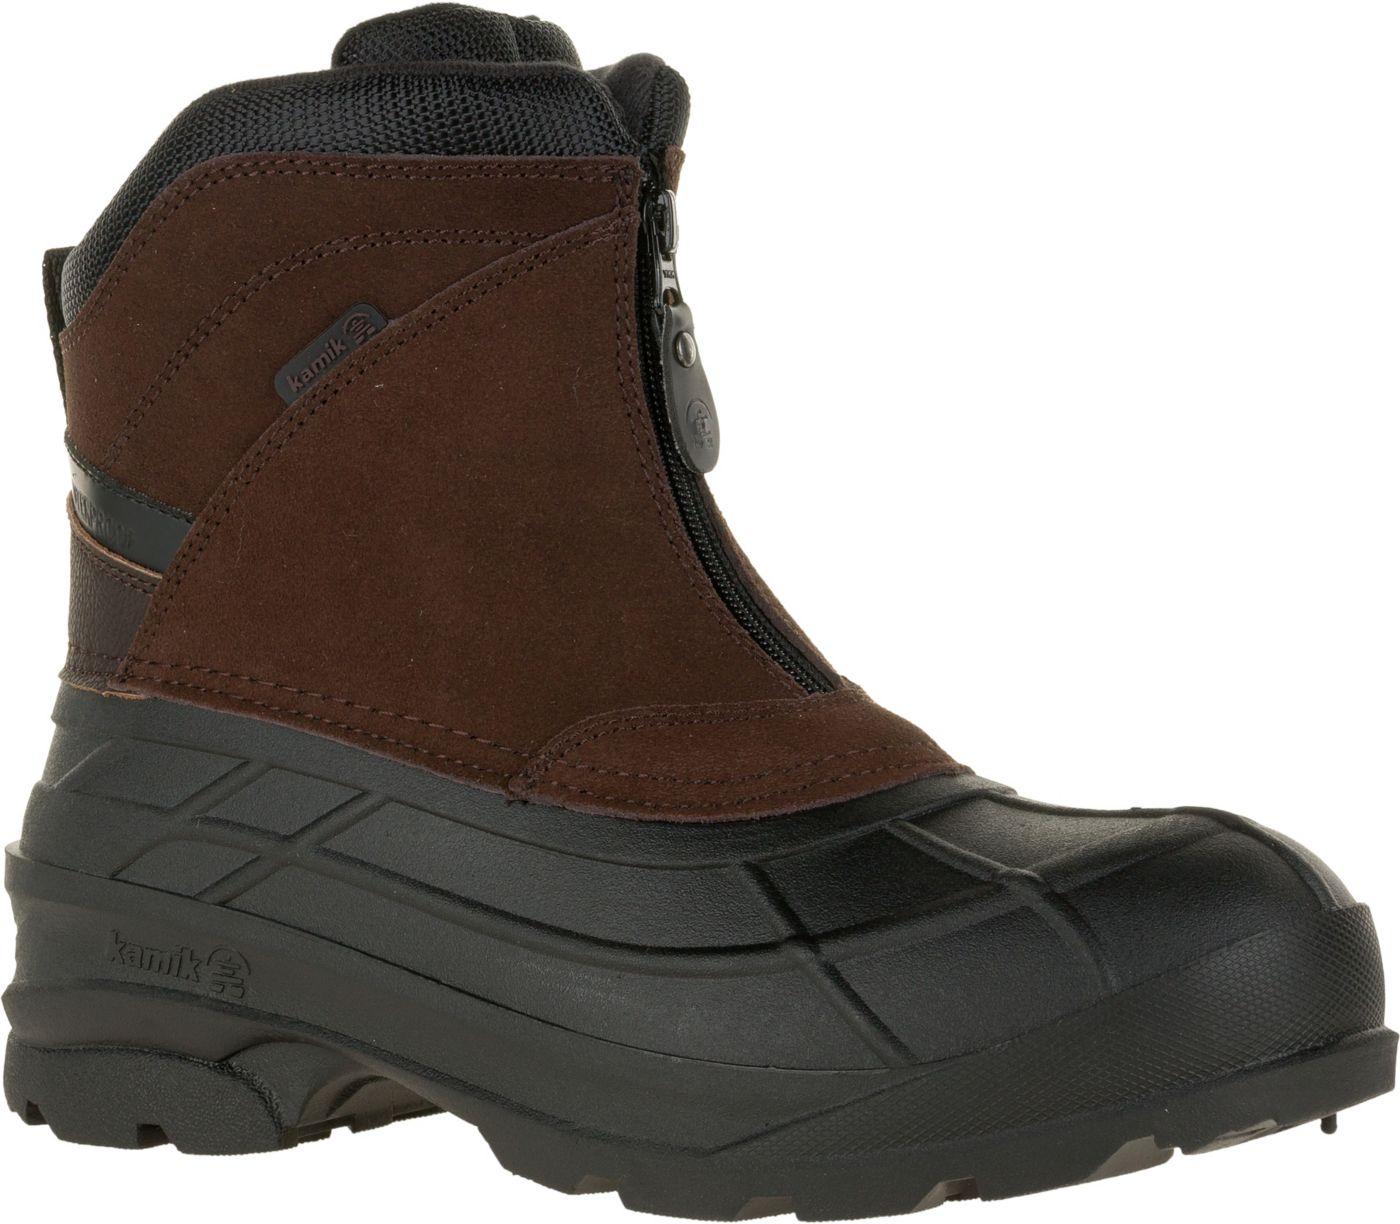 Kamik Men's Champlain2 Insulated Waterproof Winter Boots